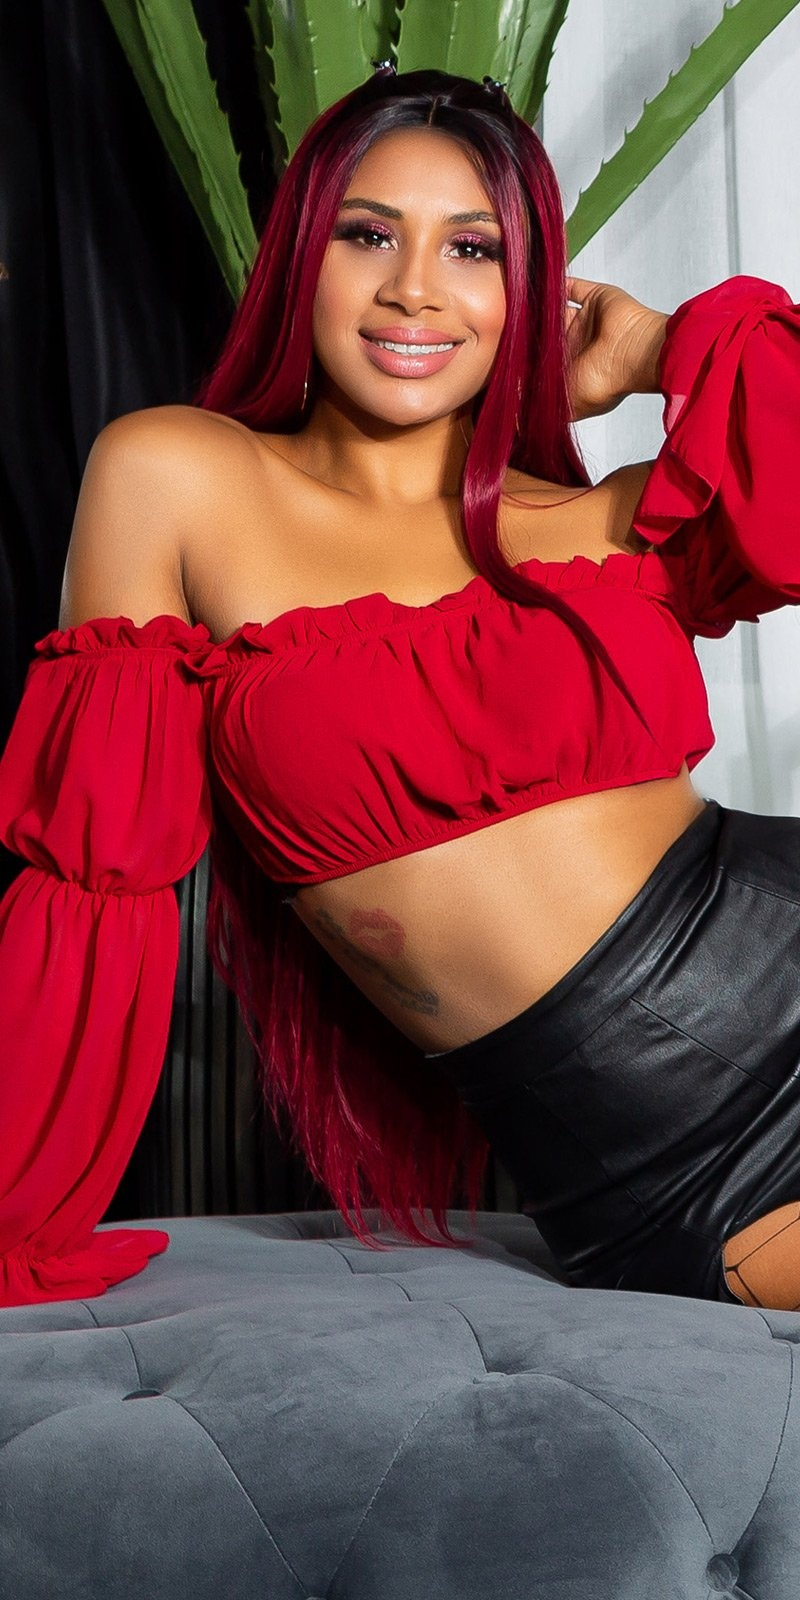 Sexy latina crop-top bordeaux